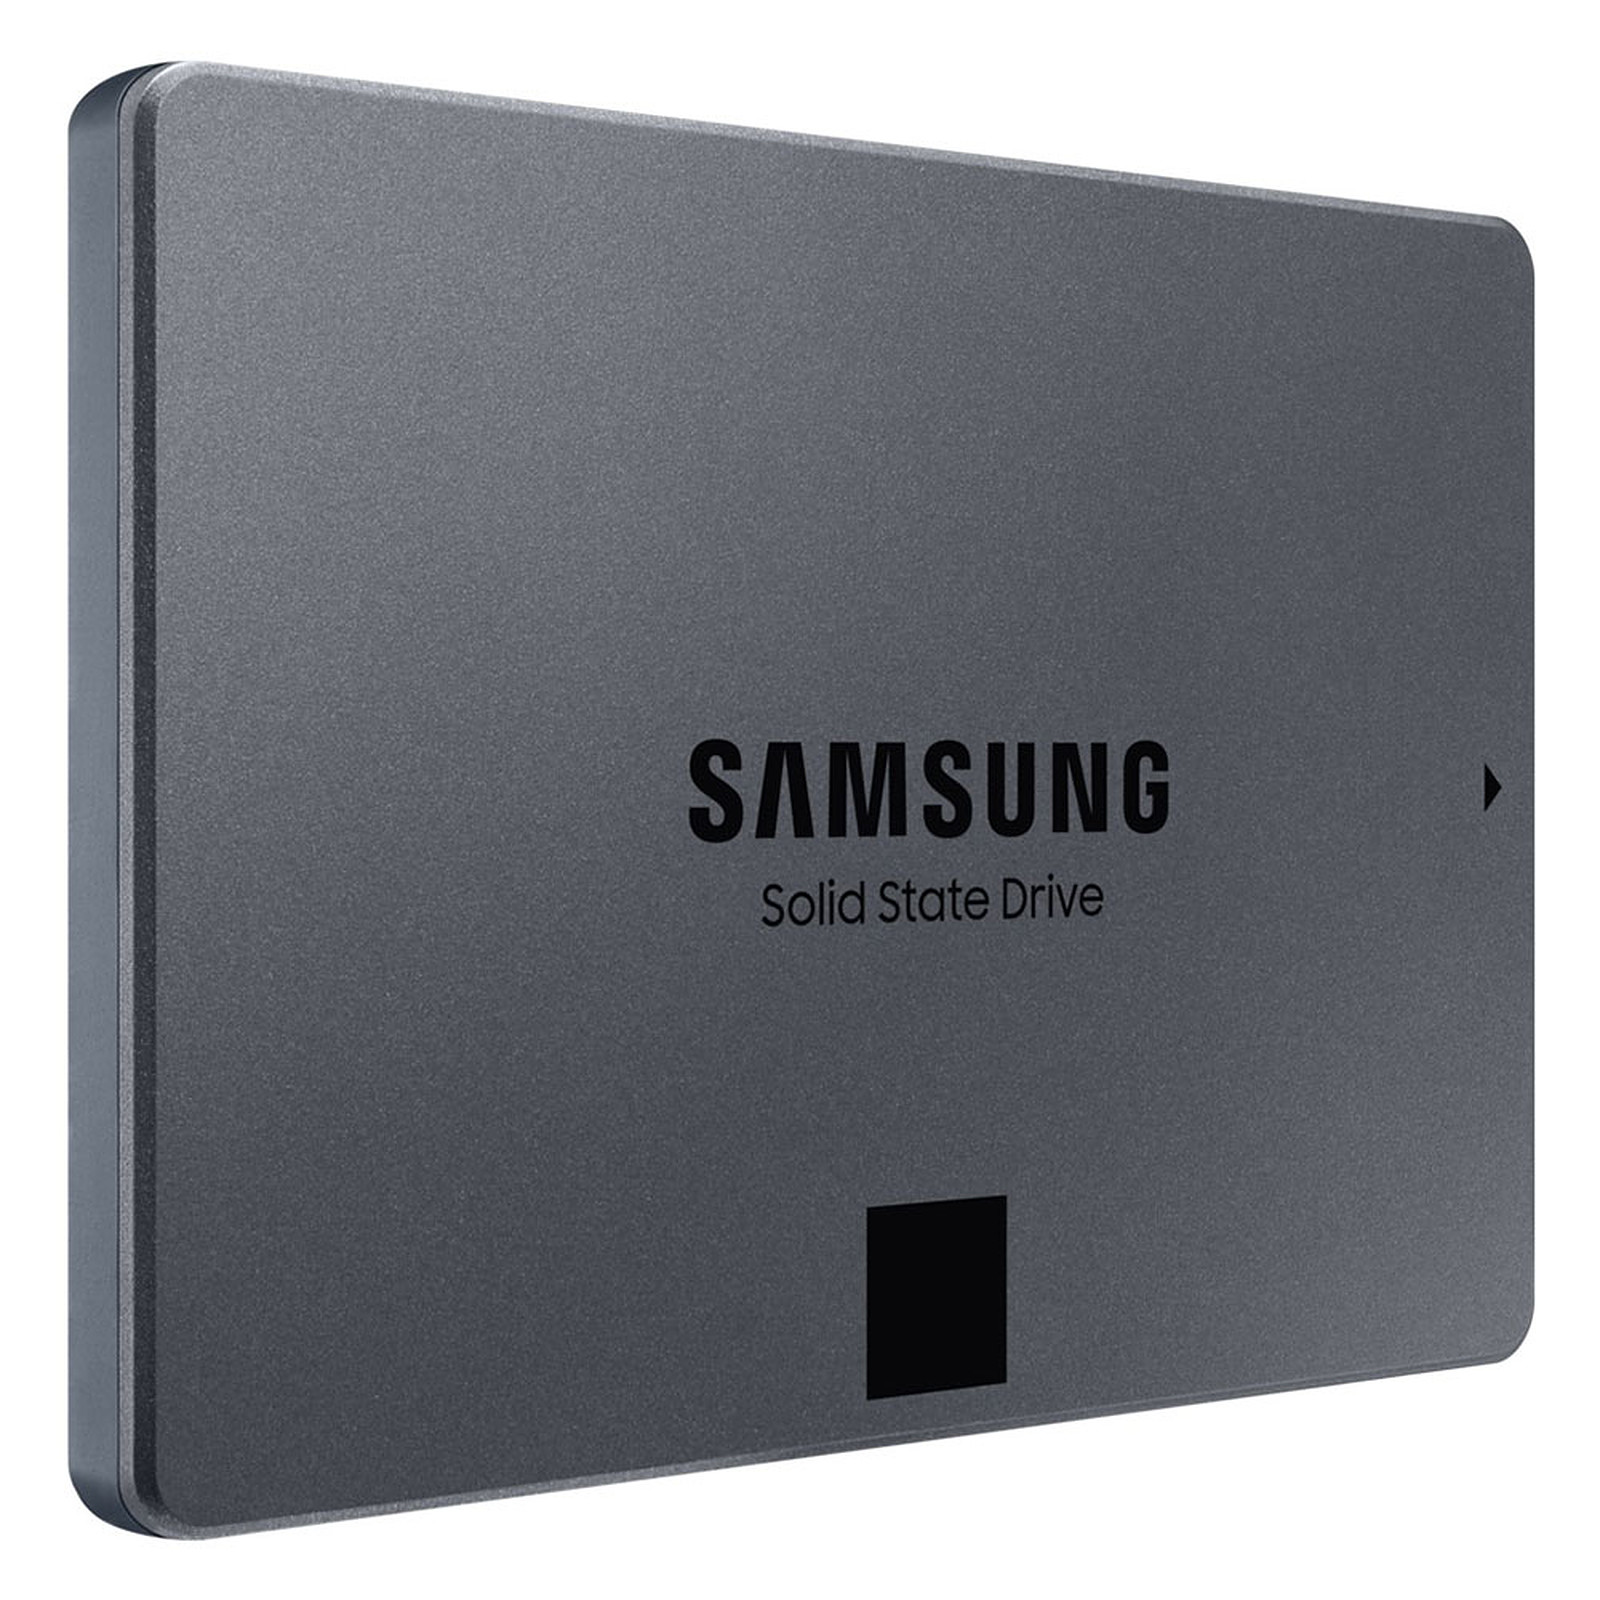 Samsung SSD 870 QVO 1 TB